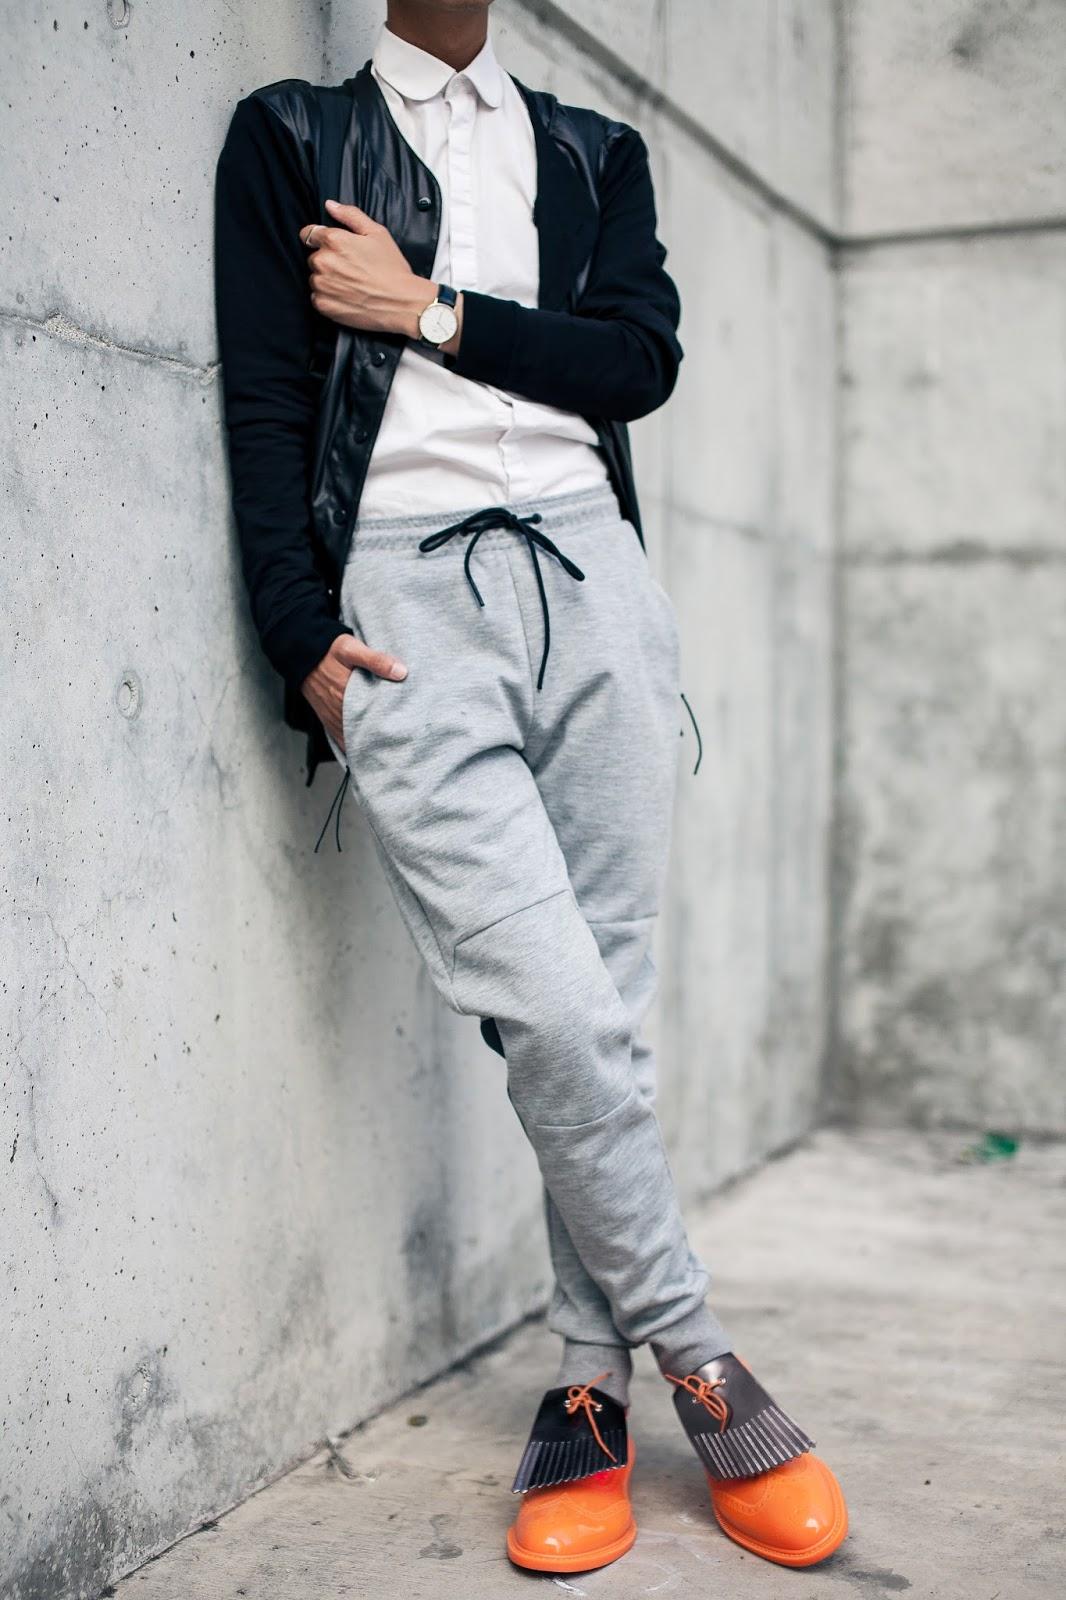 mybelonging-tommylei-menswearblogger-isaora-viviennewestwood-boohooman-saintritaparlor-asos-3.jpg